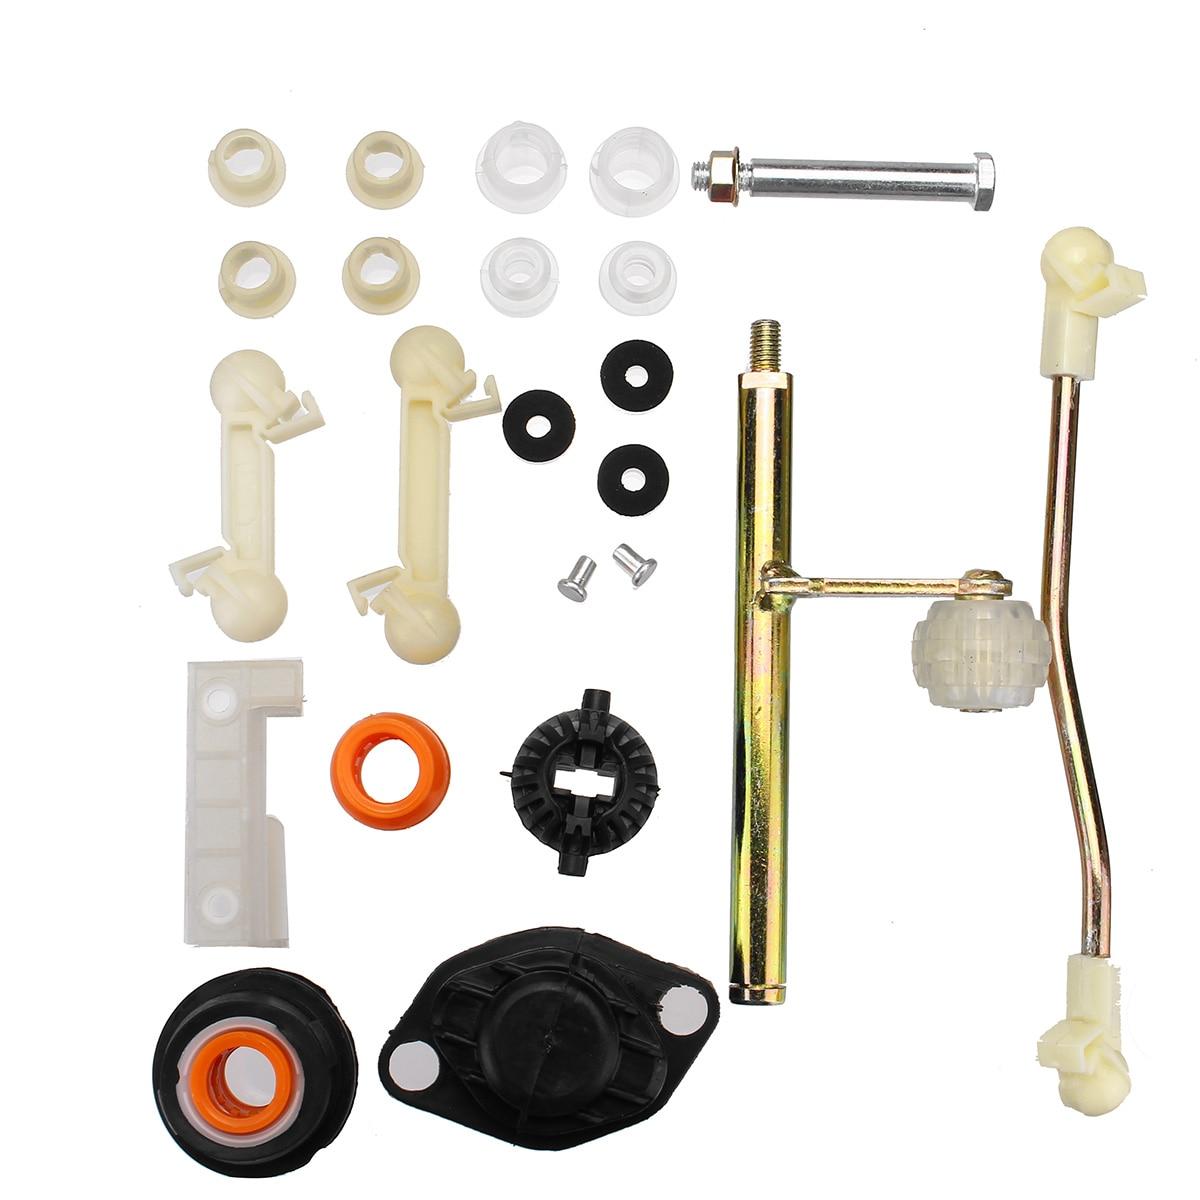 1xавтомобильный комплект для ремонта переключения передач для VW GOLF JETTA MK2 1983-1992 ремонт переключения передач 191711574 191711595A 191798116A